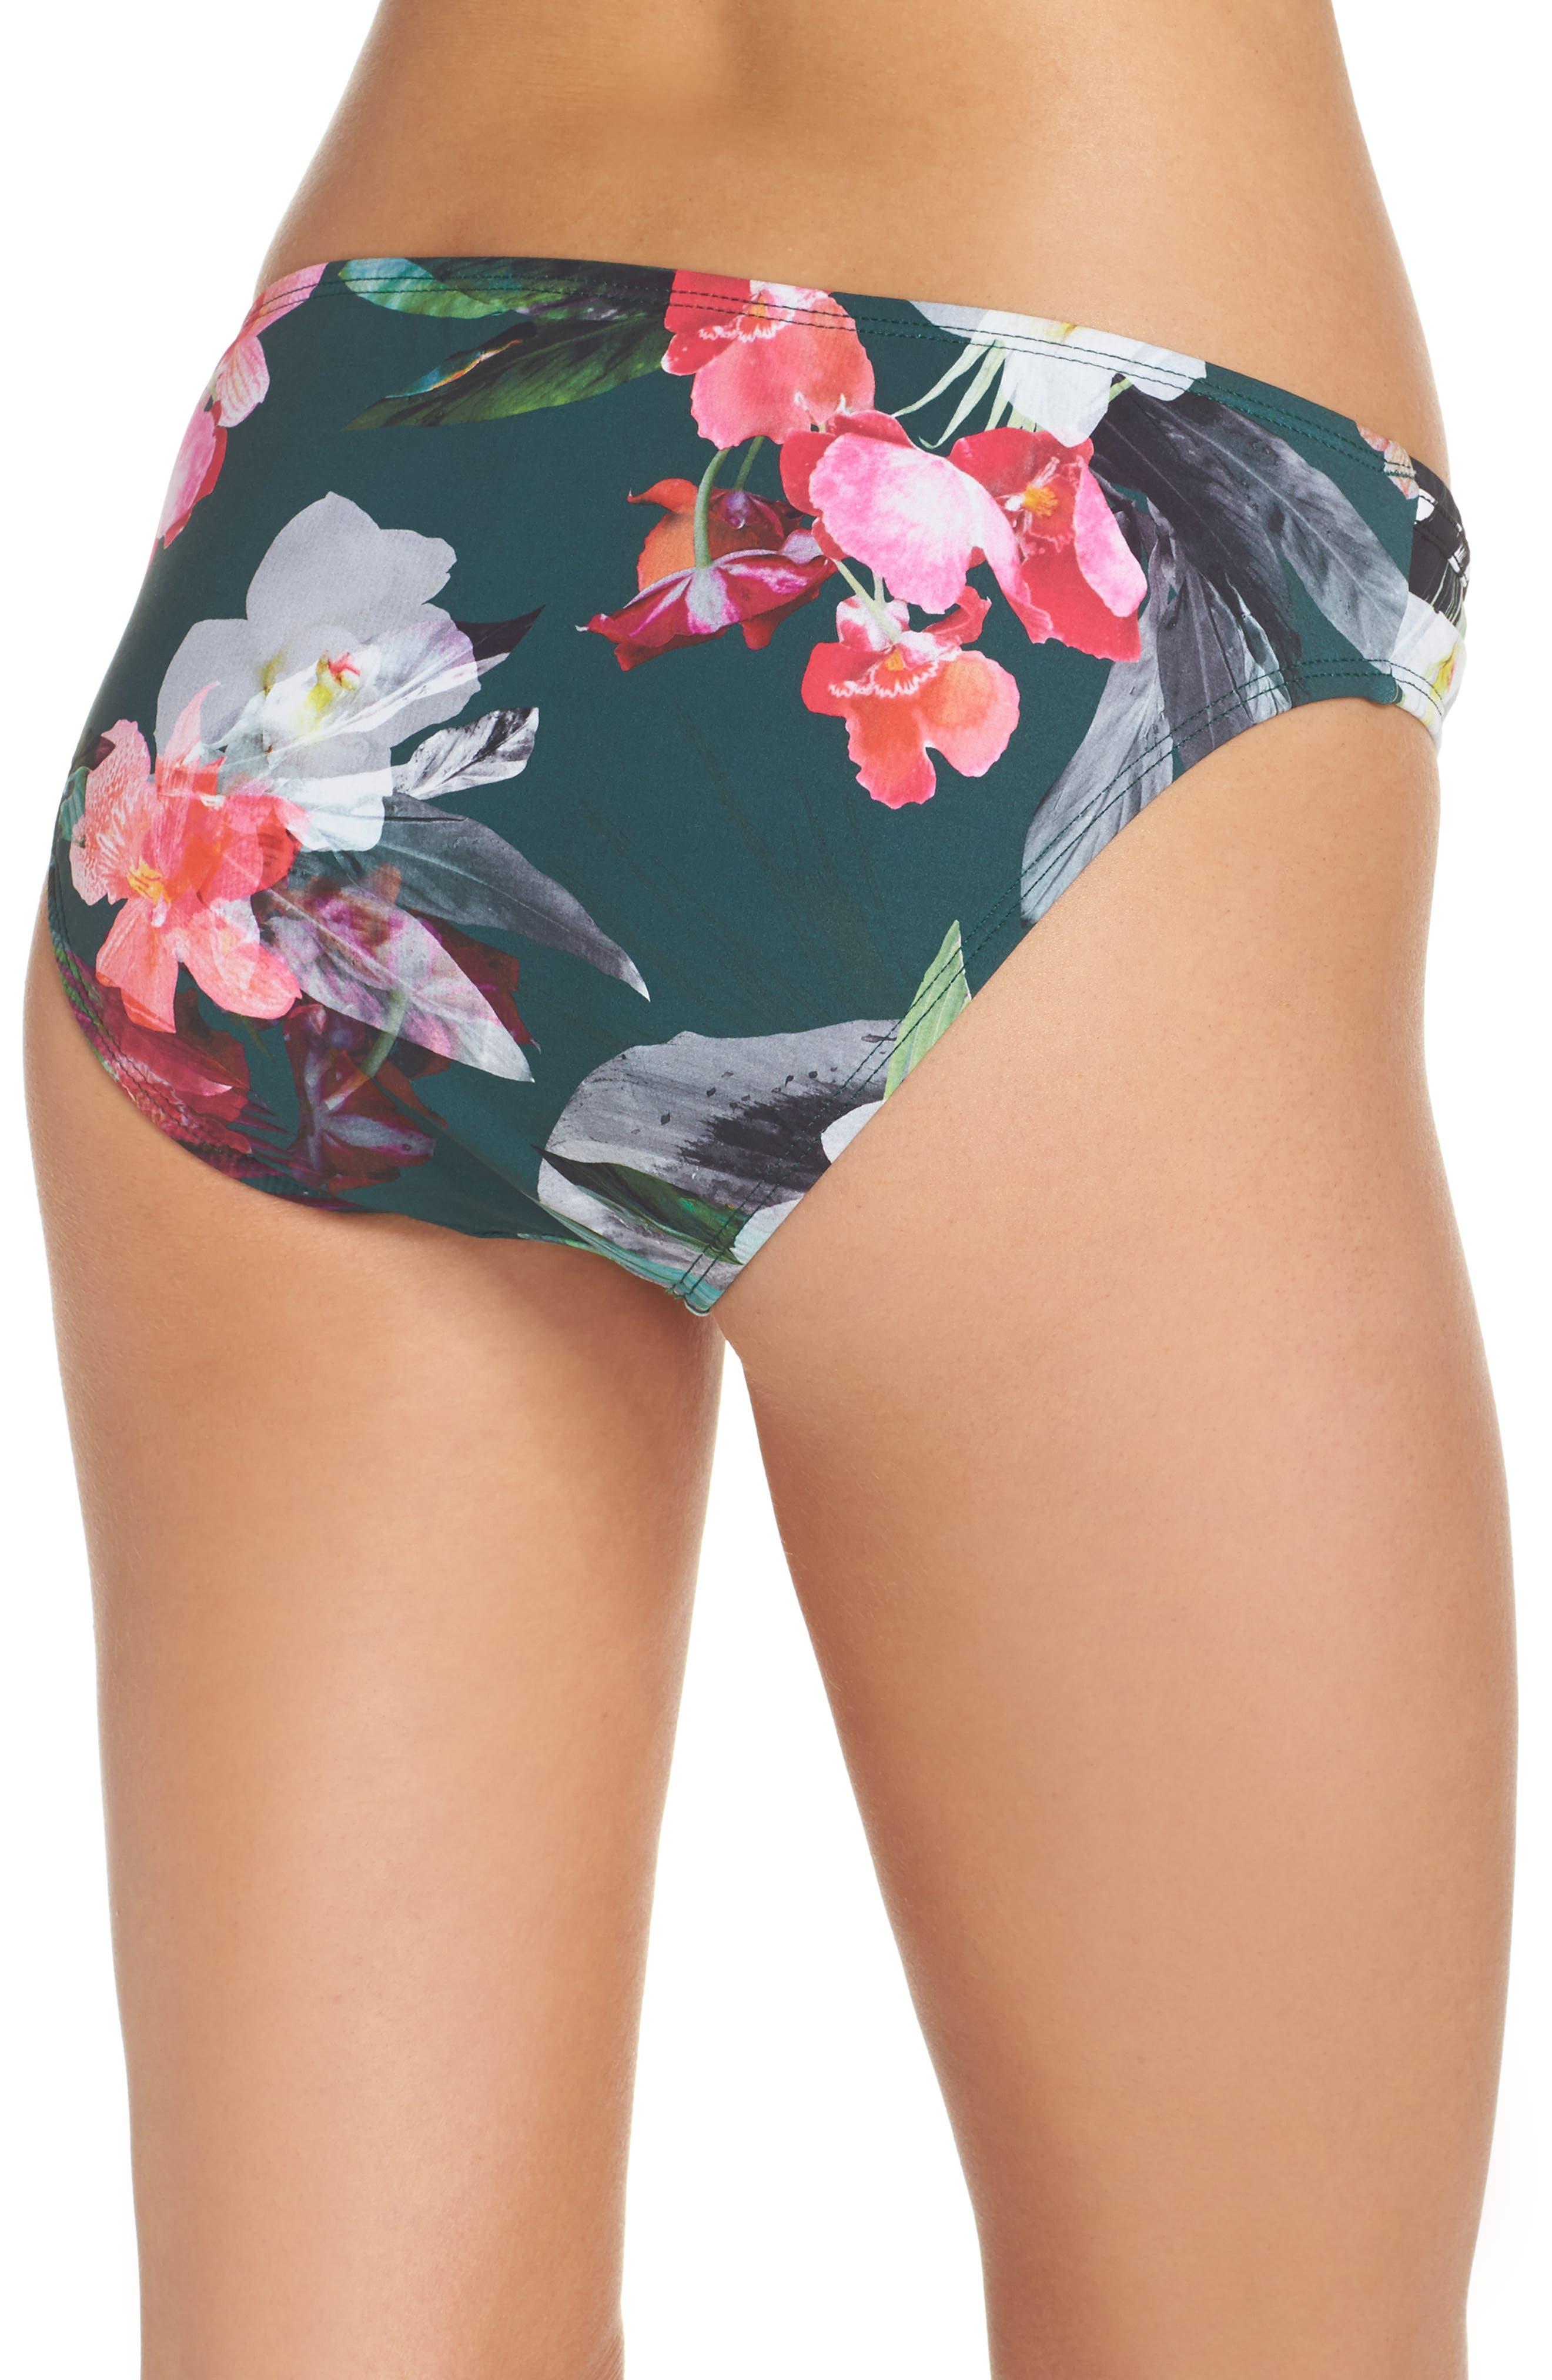 Jungle Floral Shirred Hipster Bikini Bottoms,                             Alternate thumbnail 2, color,                             301